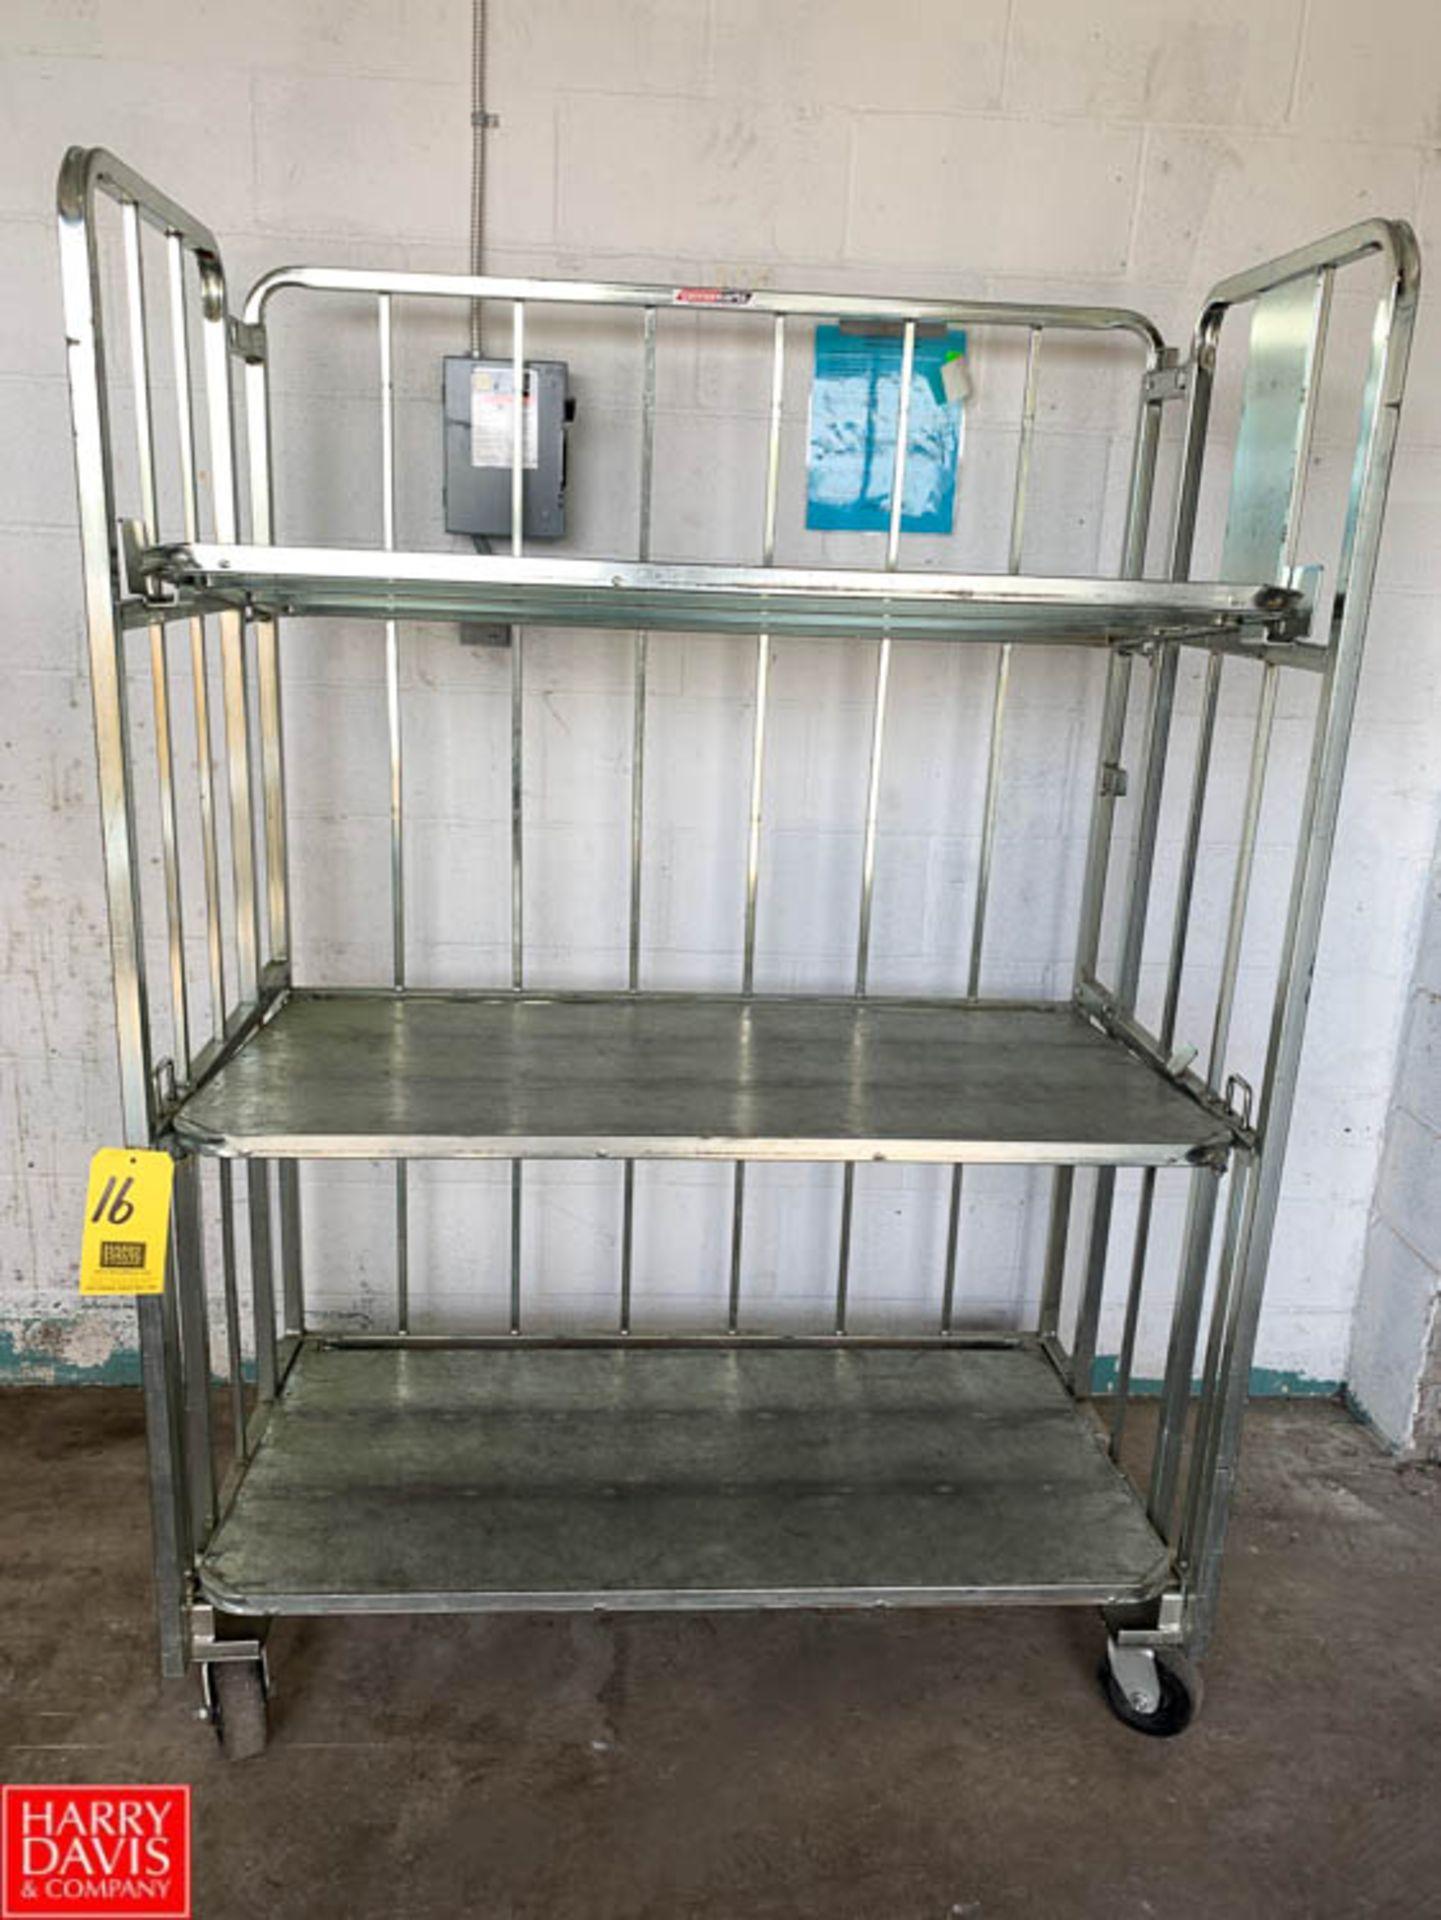 Lot 16 - Cannon 84 Gallon S/S Bossy Cart, Model 4-13MM83-0263-300 - Rigging Fee: $10